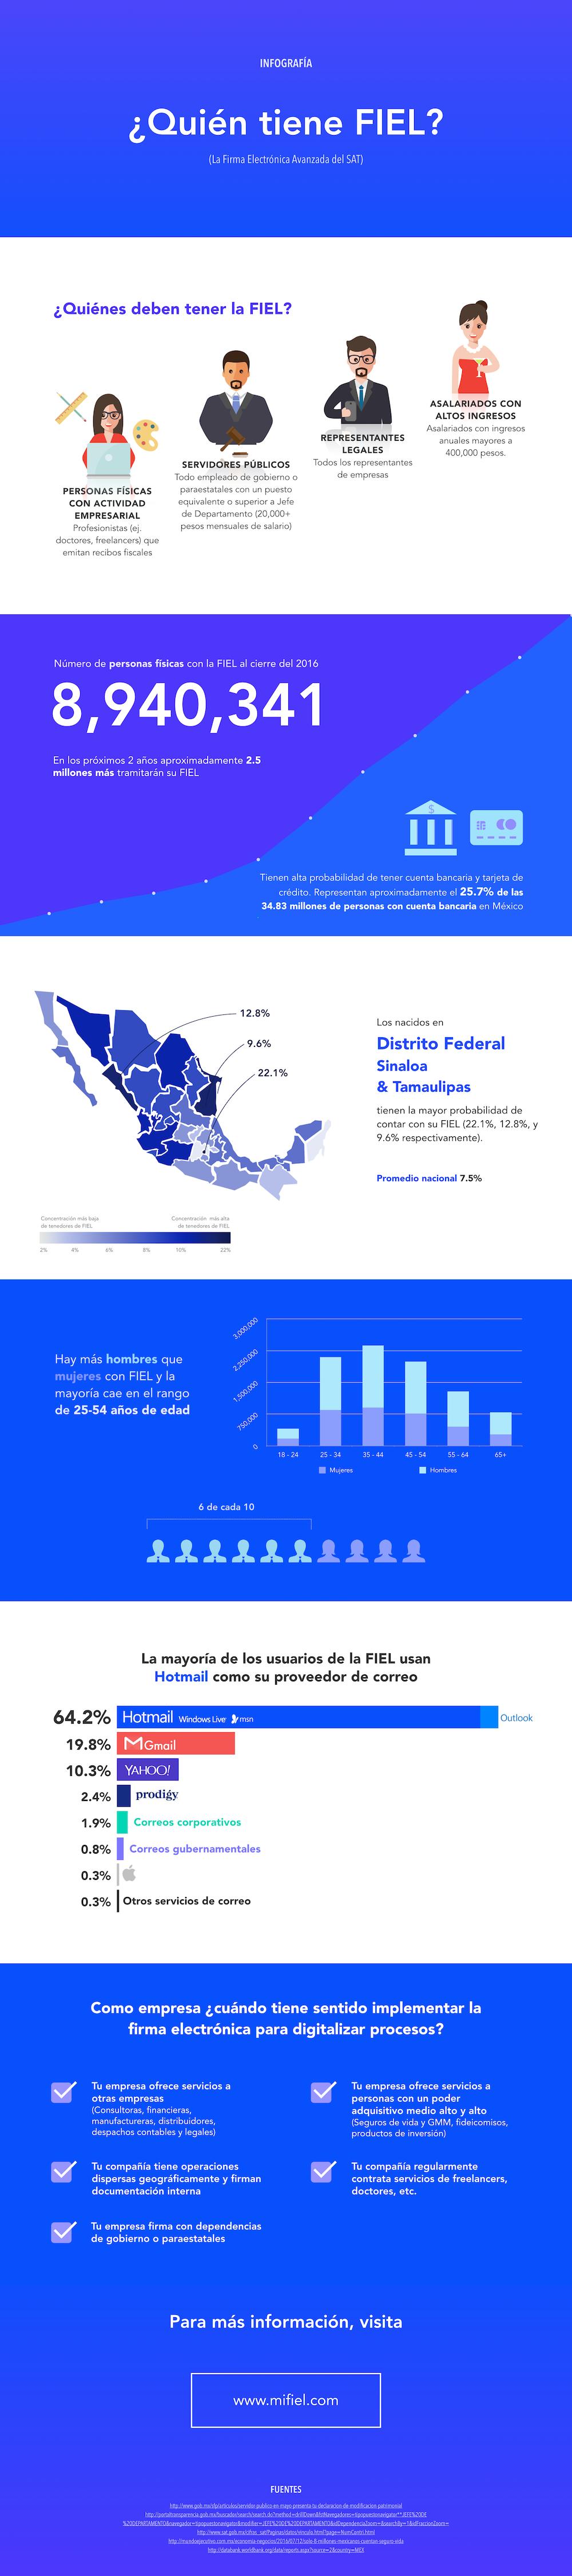 fiel-infografia-mifiel